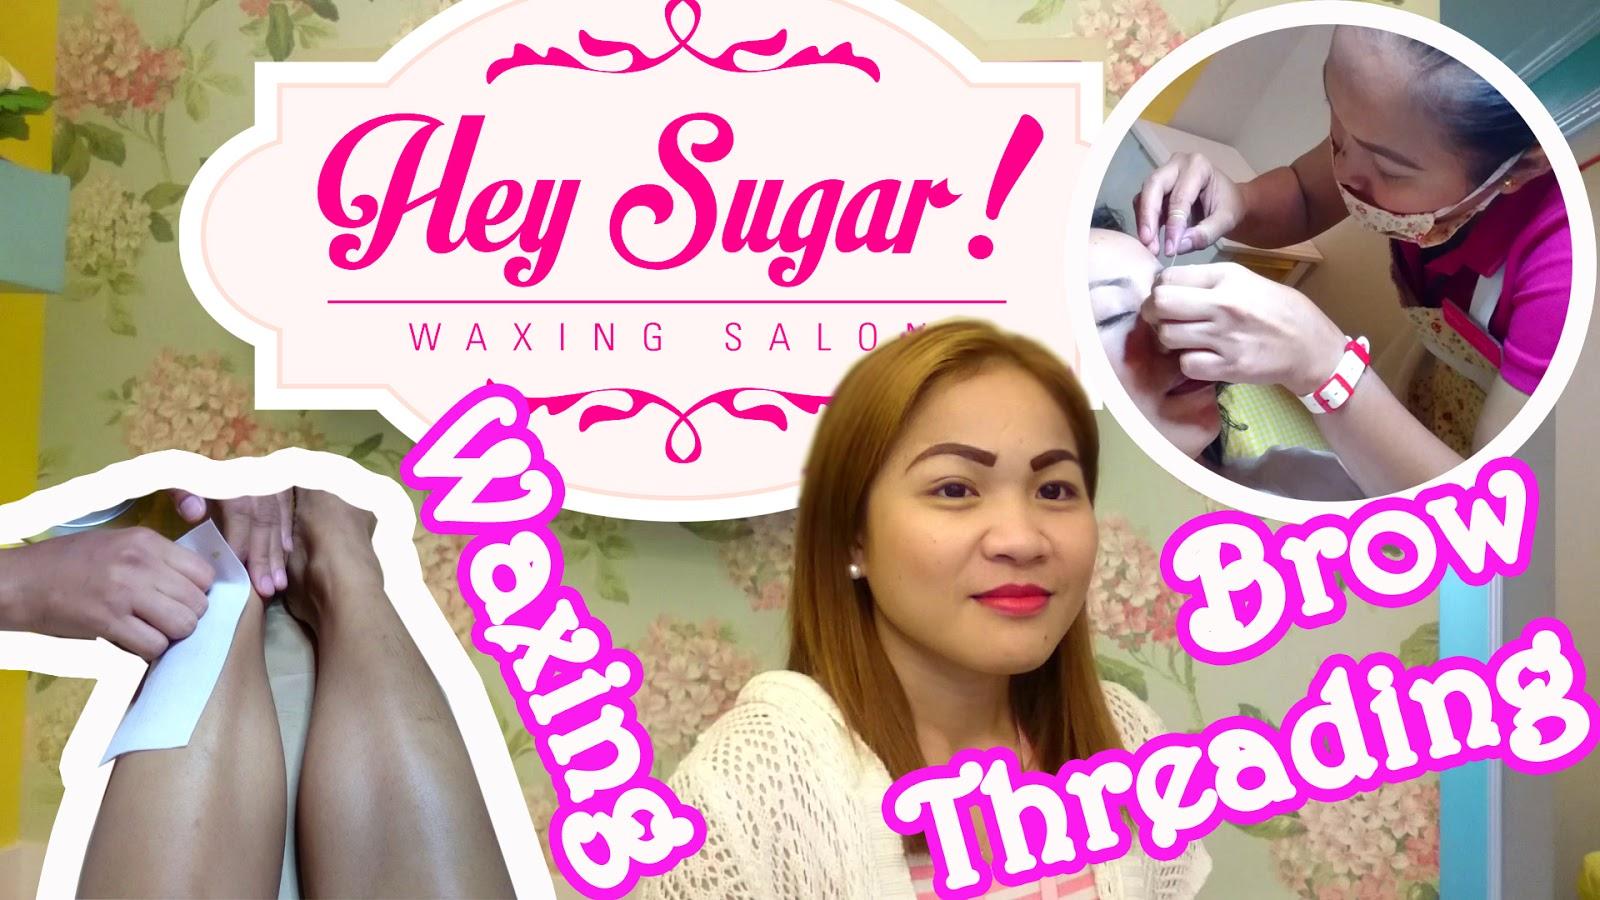 Hey Sugar Experience Brow Threading And Leg Waxing God Is Good